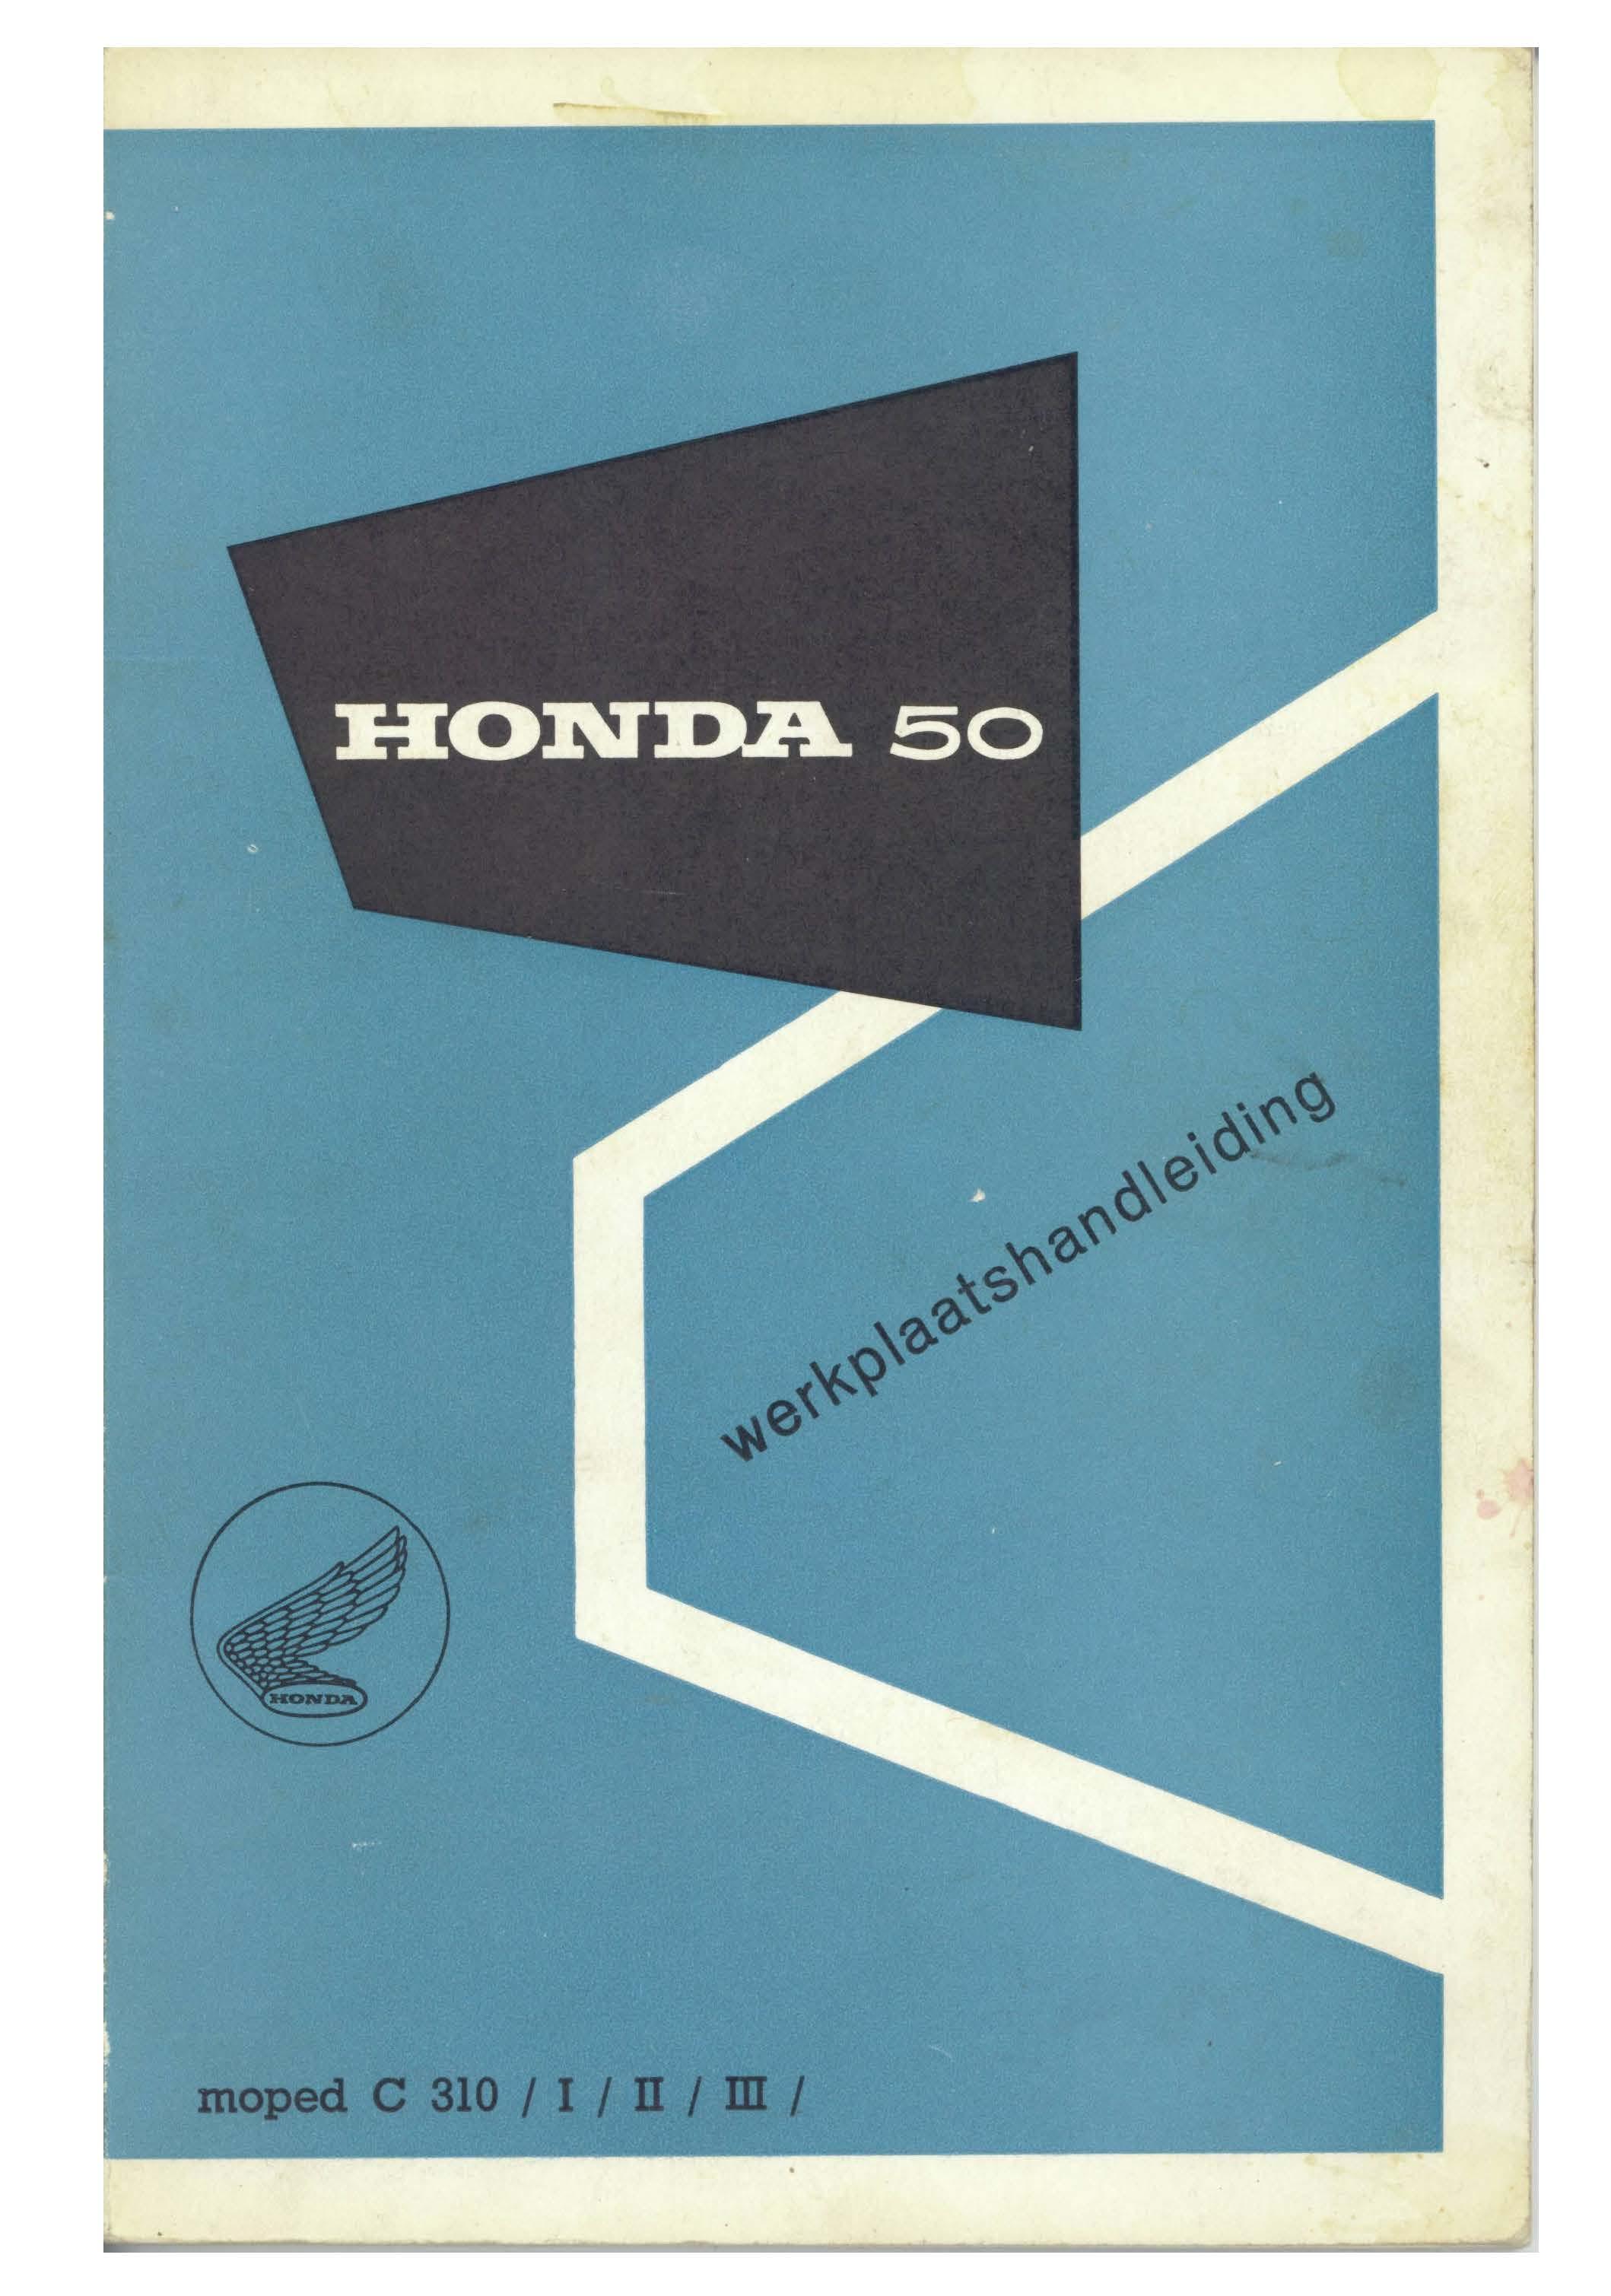 Workshop manual for Honda C310A (Mk. 1, 2 and 3)